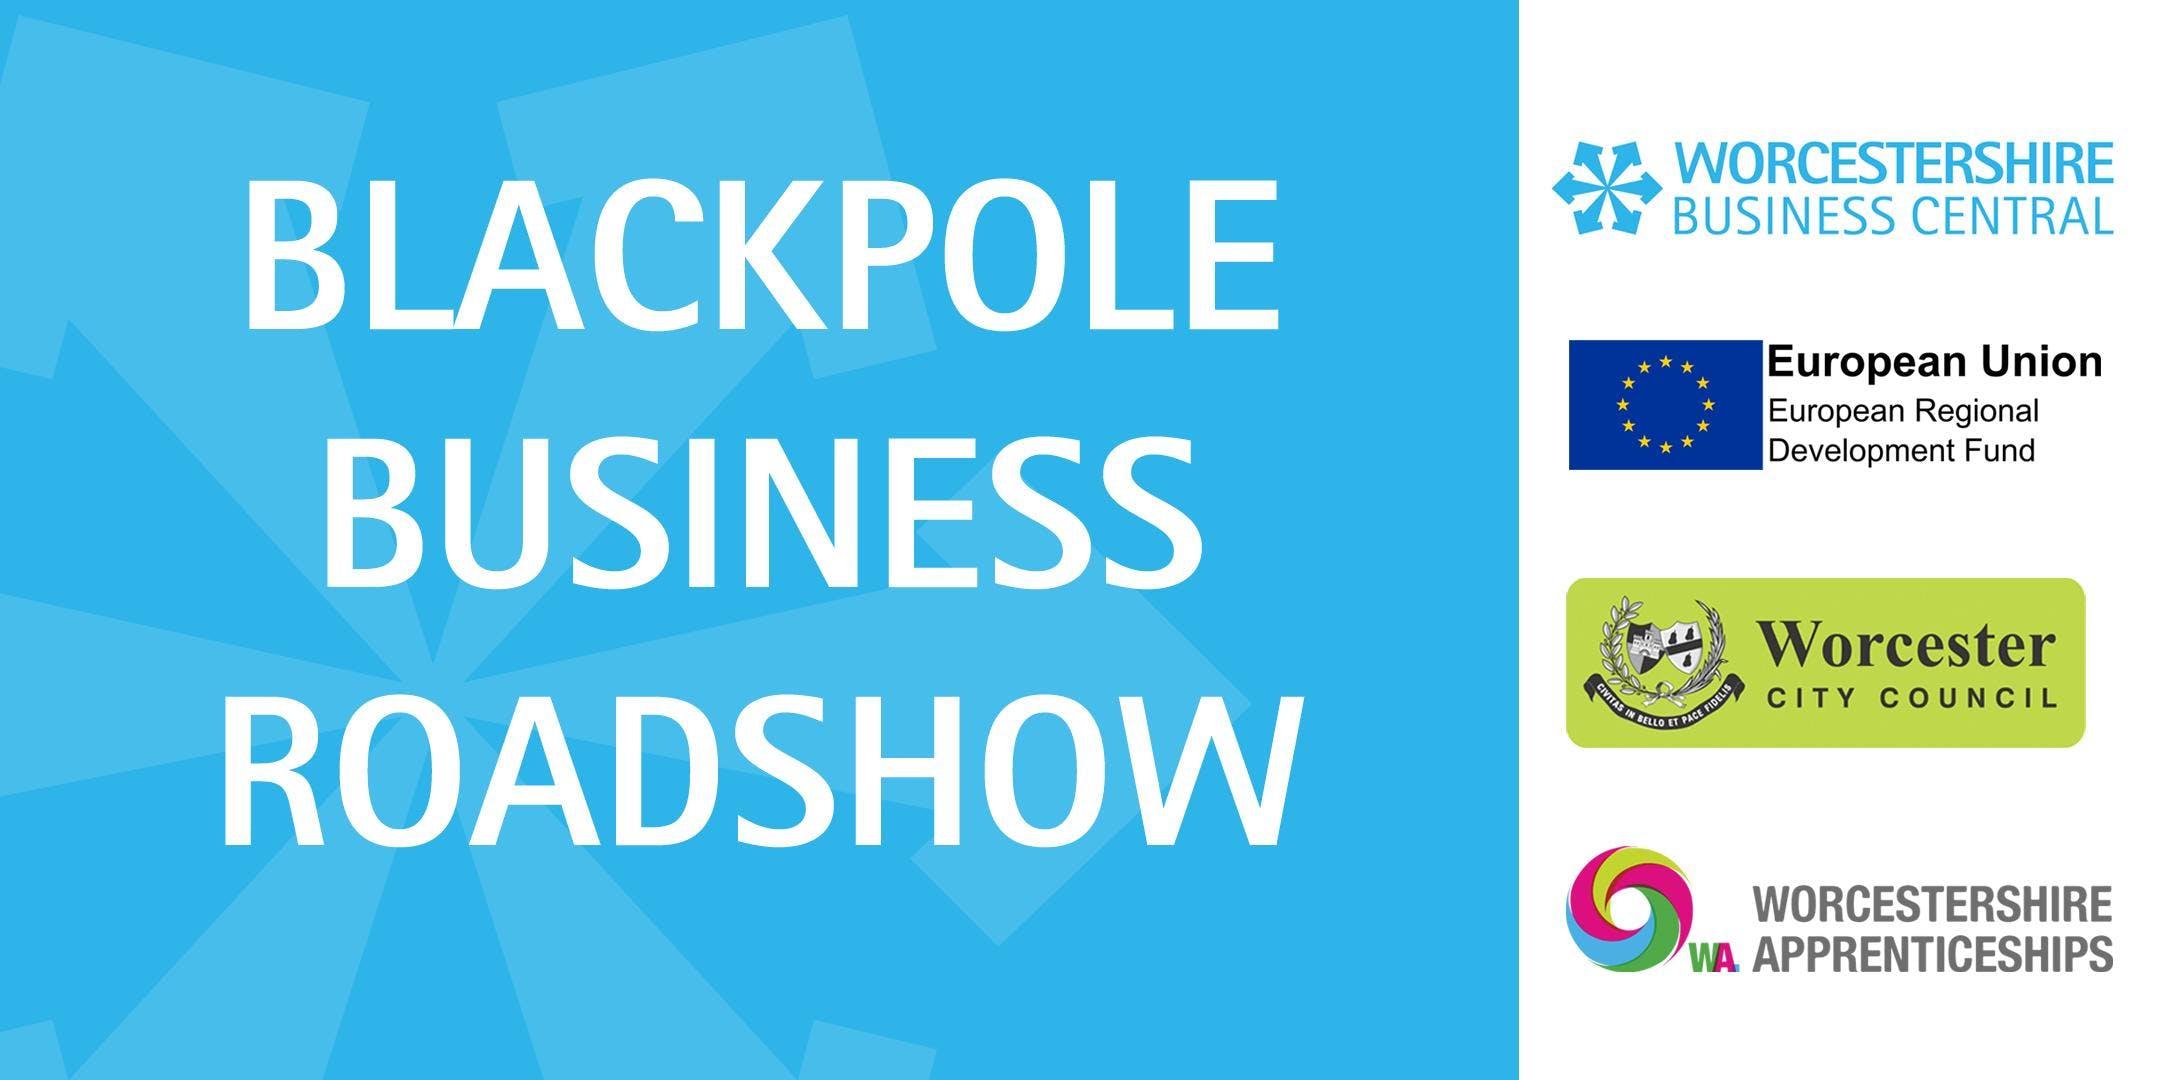 blackpole business roadshow at suite 2 wr3 8sg worcester